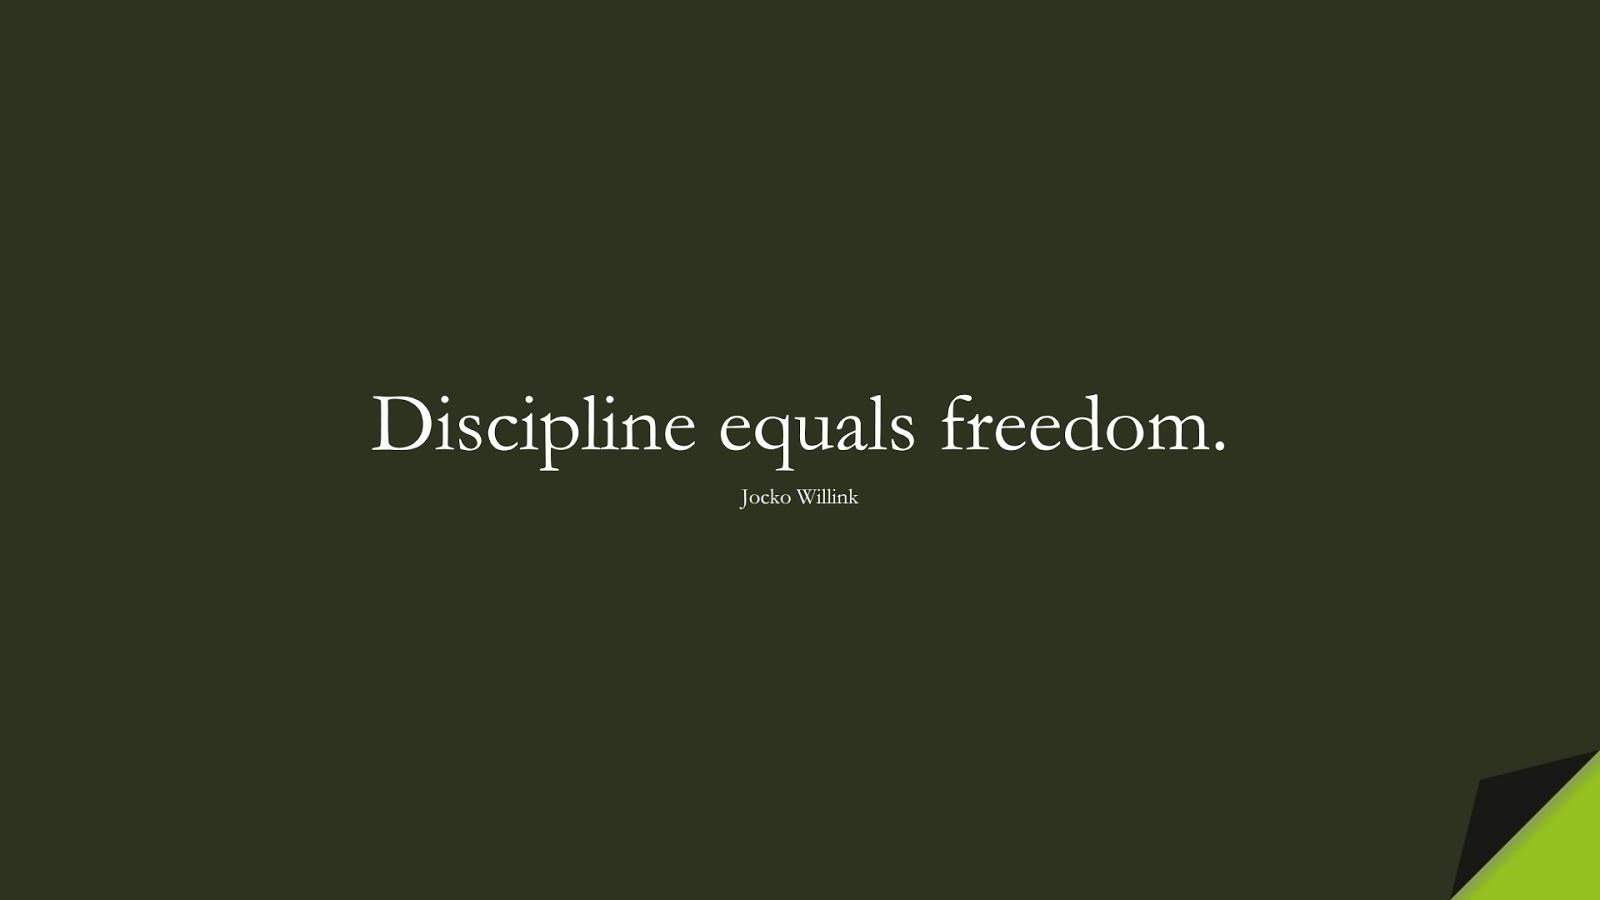 Discipline equals freedom. (Jocko Willink);  #CharacterQuotes